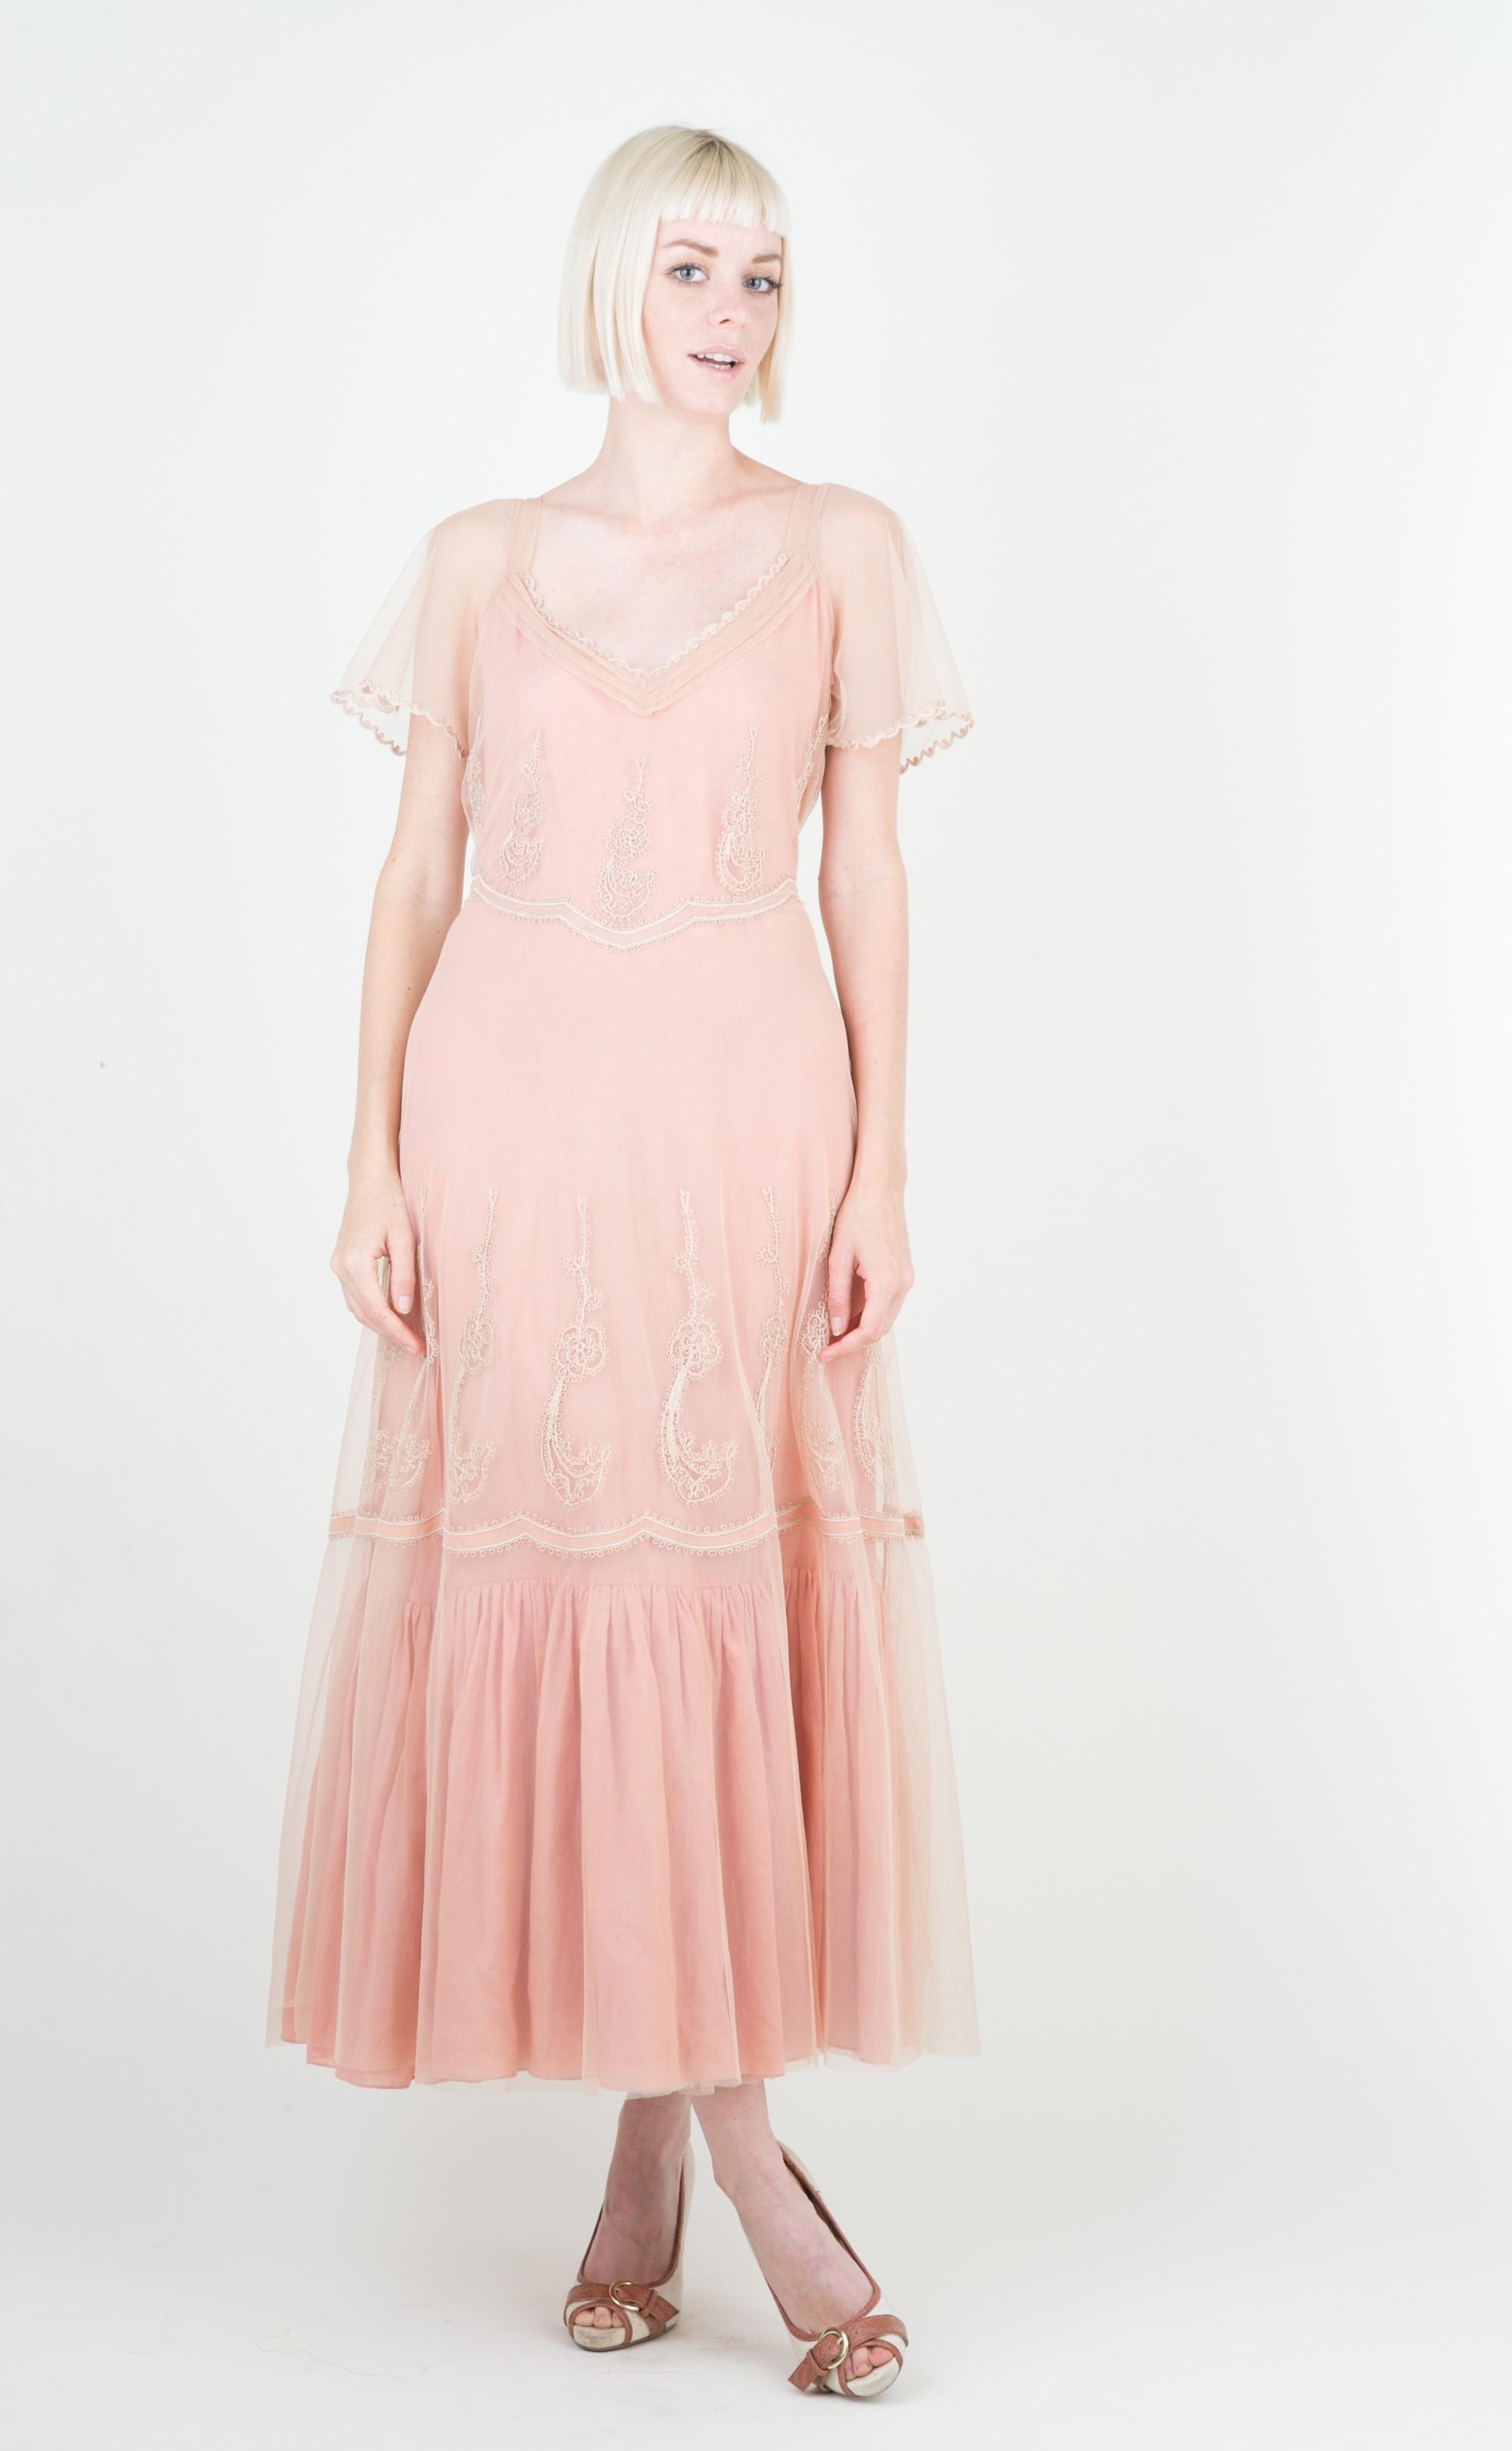 Nataya Sweet Vintage Bride Dress - 40192 Buy Nataya Dresses at the WS